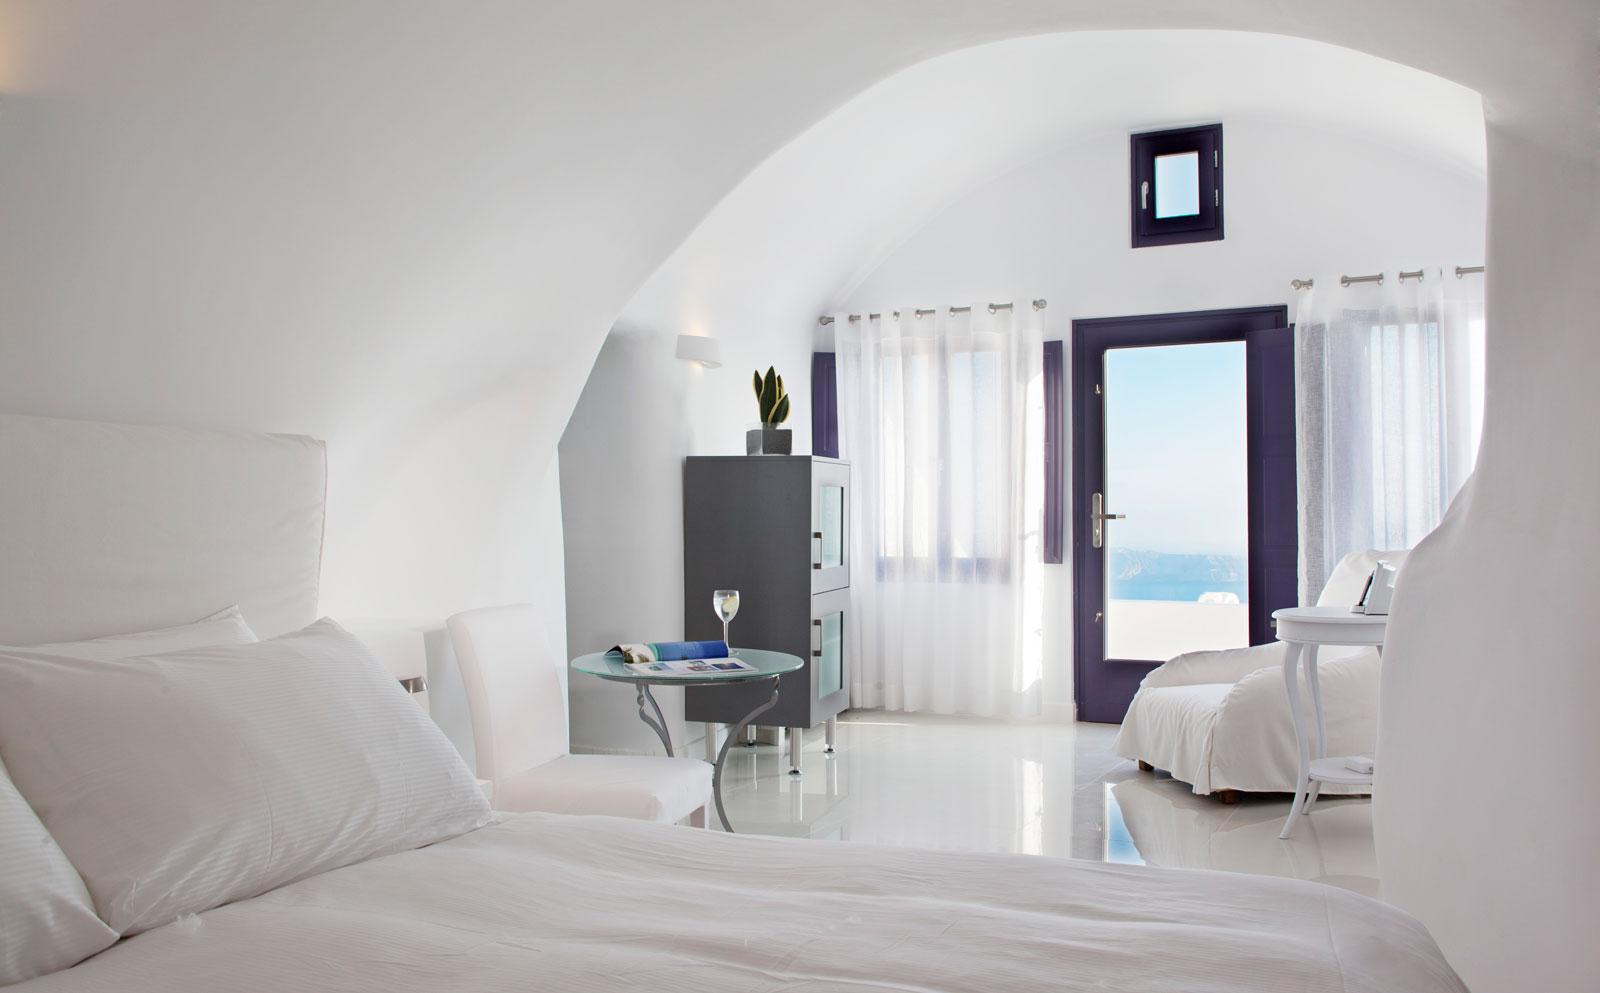 Chromate Santorini, Where to Stay in Greece.